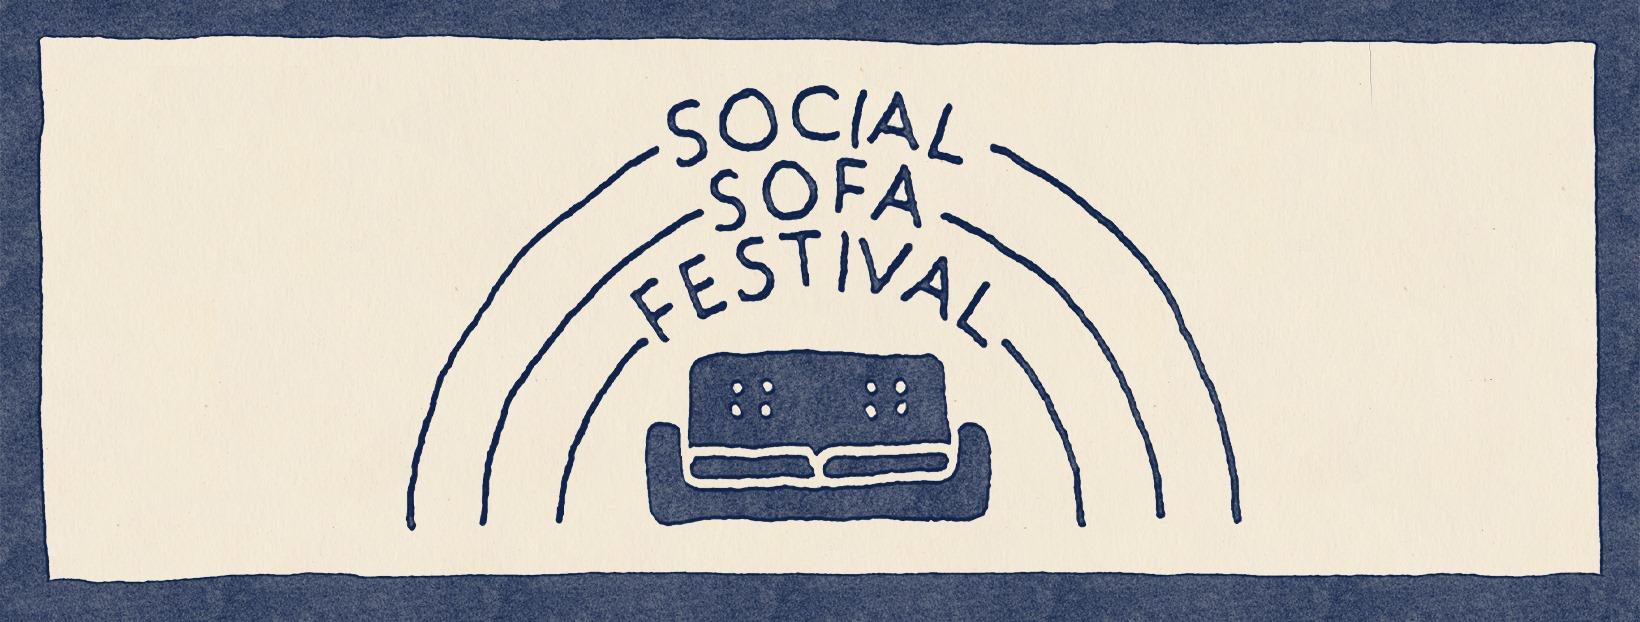 Das Social Sofa Festival findet auf Instagram statt.